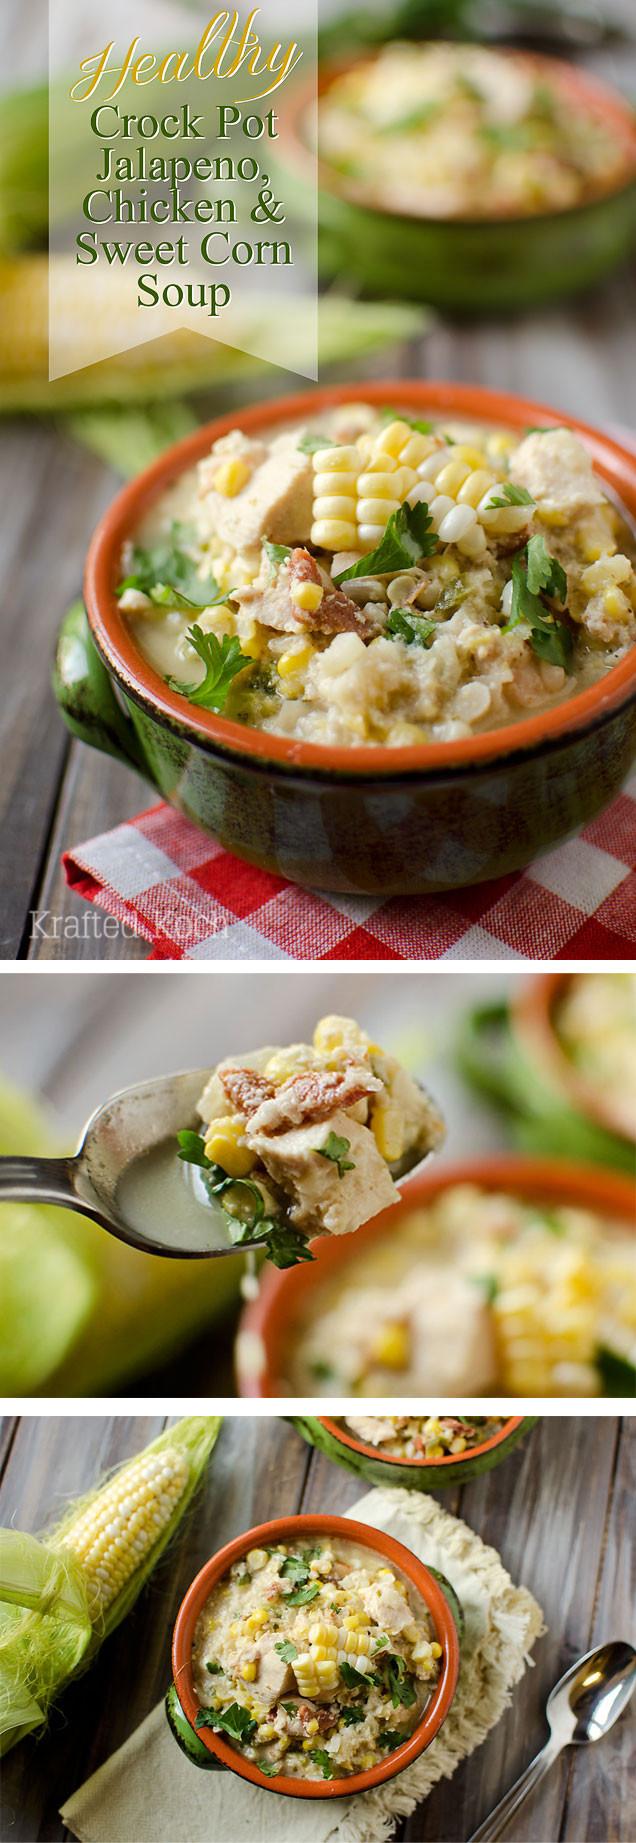 Crockpot Soups Healthy  Healthy Crock Pot Jalapeno Chicken & Sweet Corn Soup